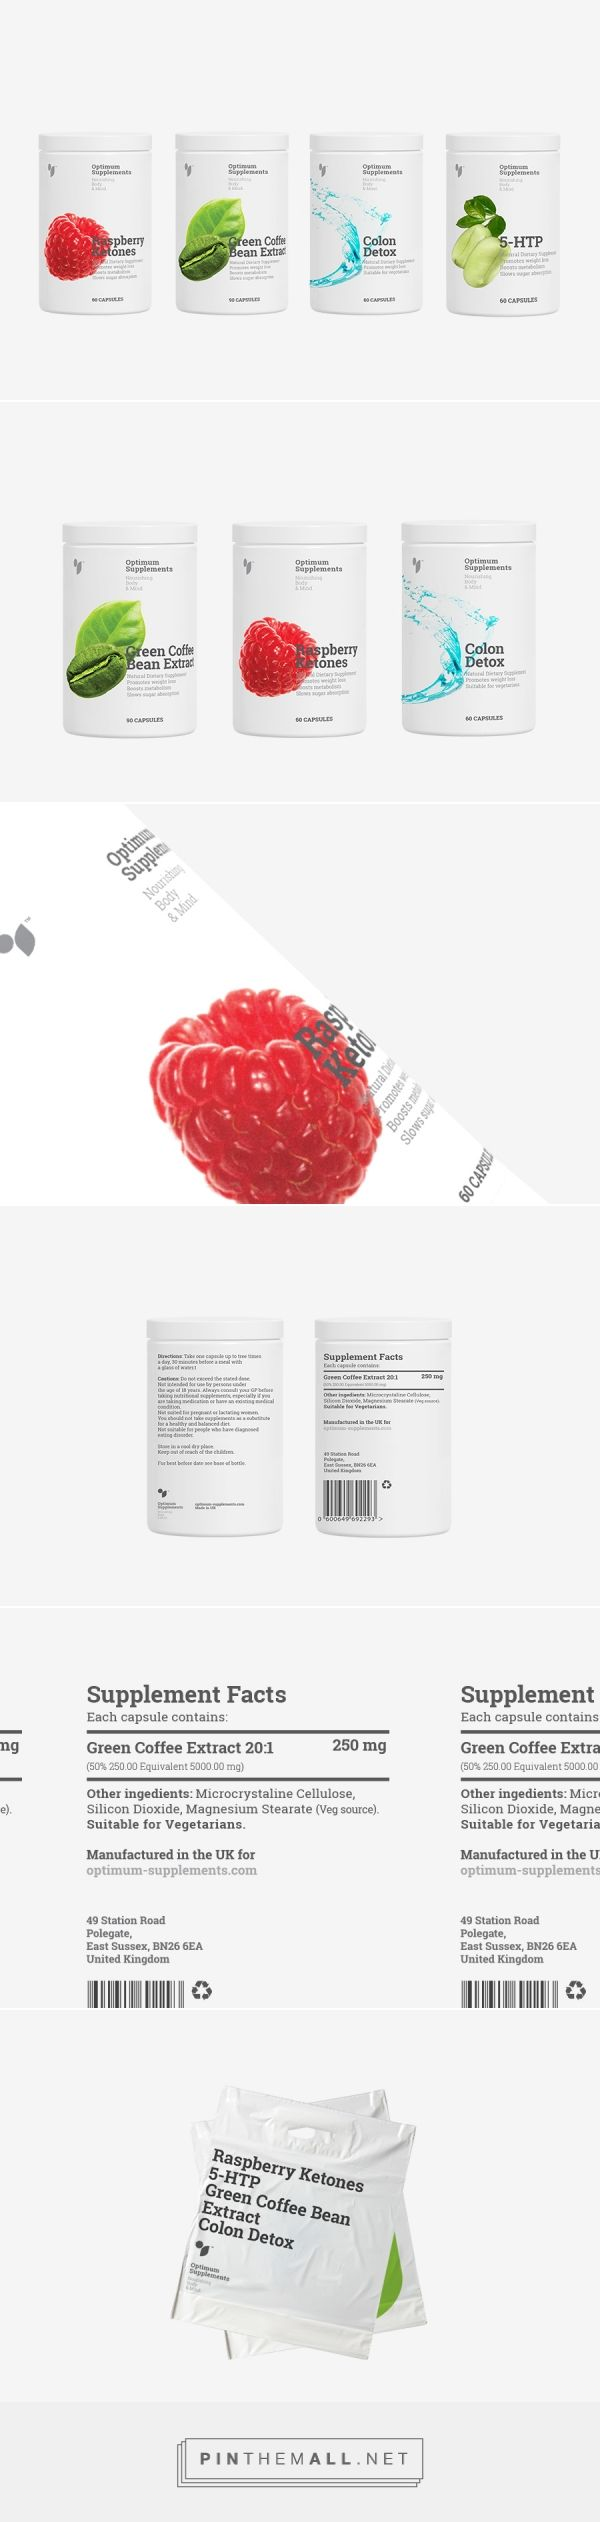 Optimum Supplements™ on Behance by Aleksandar Cvetković, Inc.® Nis, Serbia curated by Packaging Diva PD. Appealing supplement packaging.